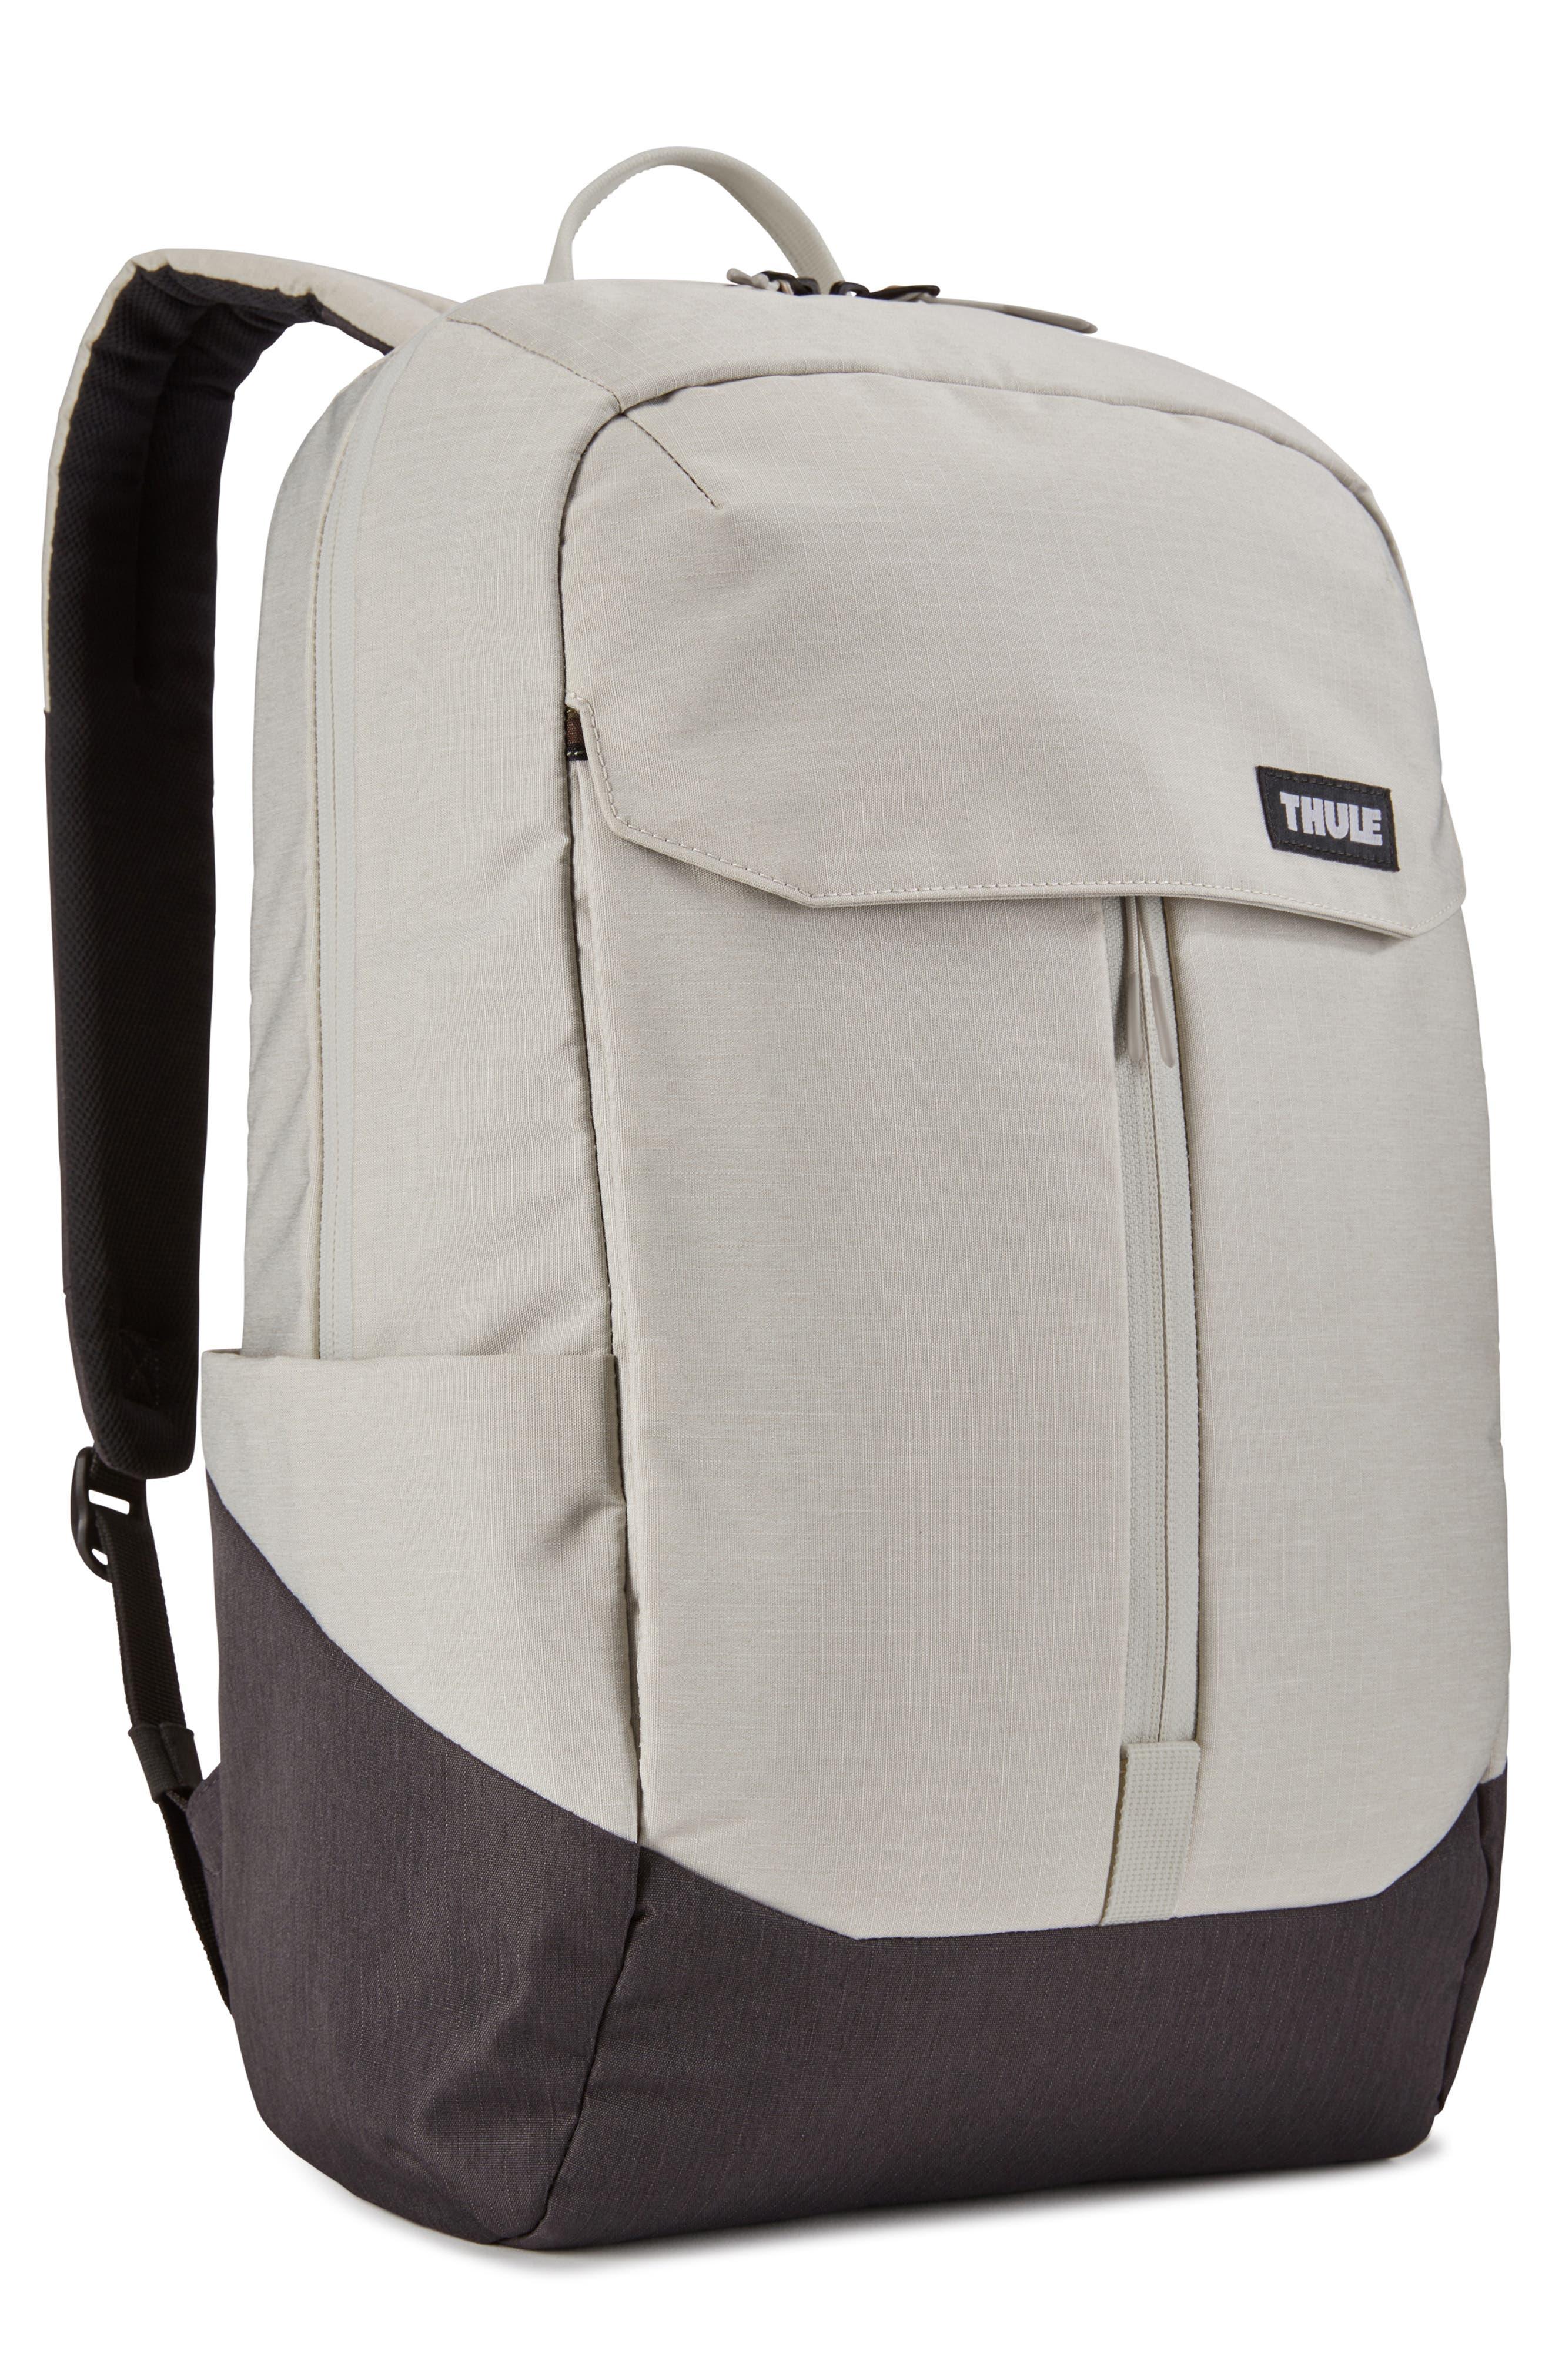 Thule Lithos Backpack - Grey